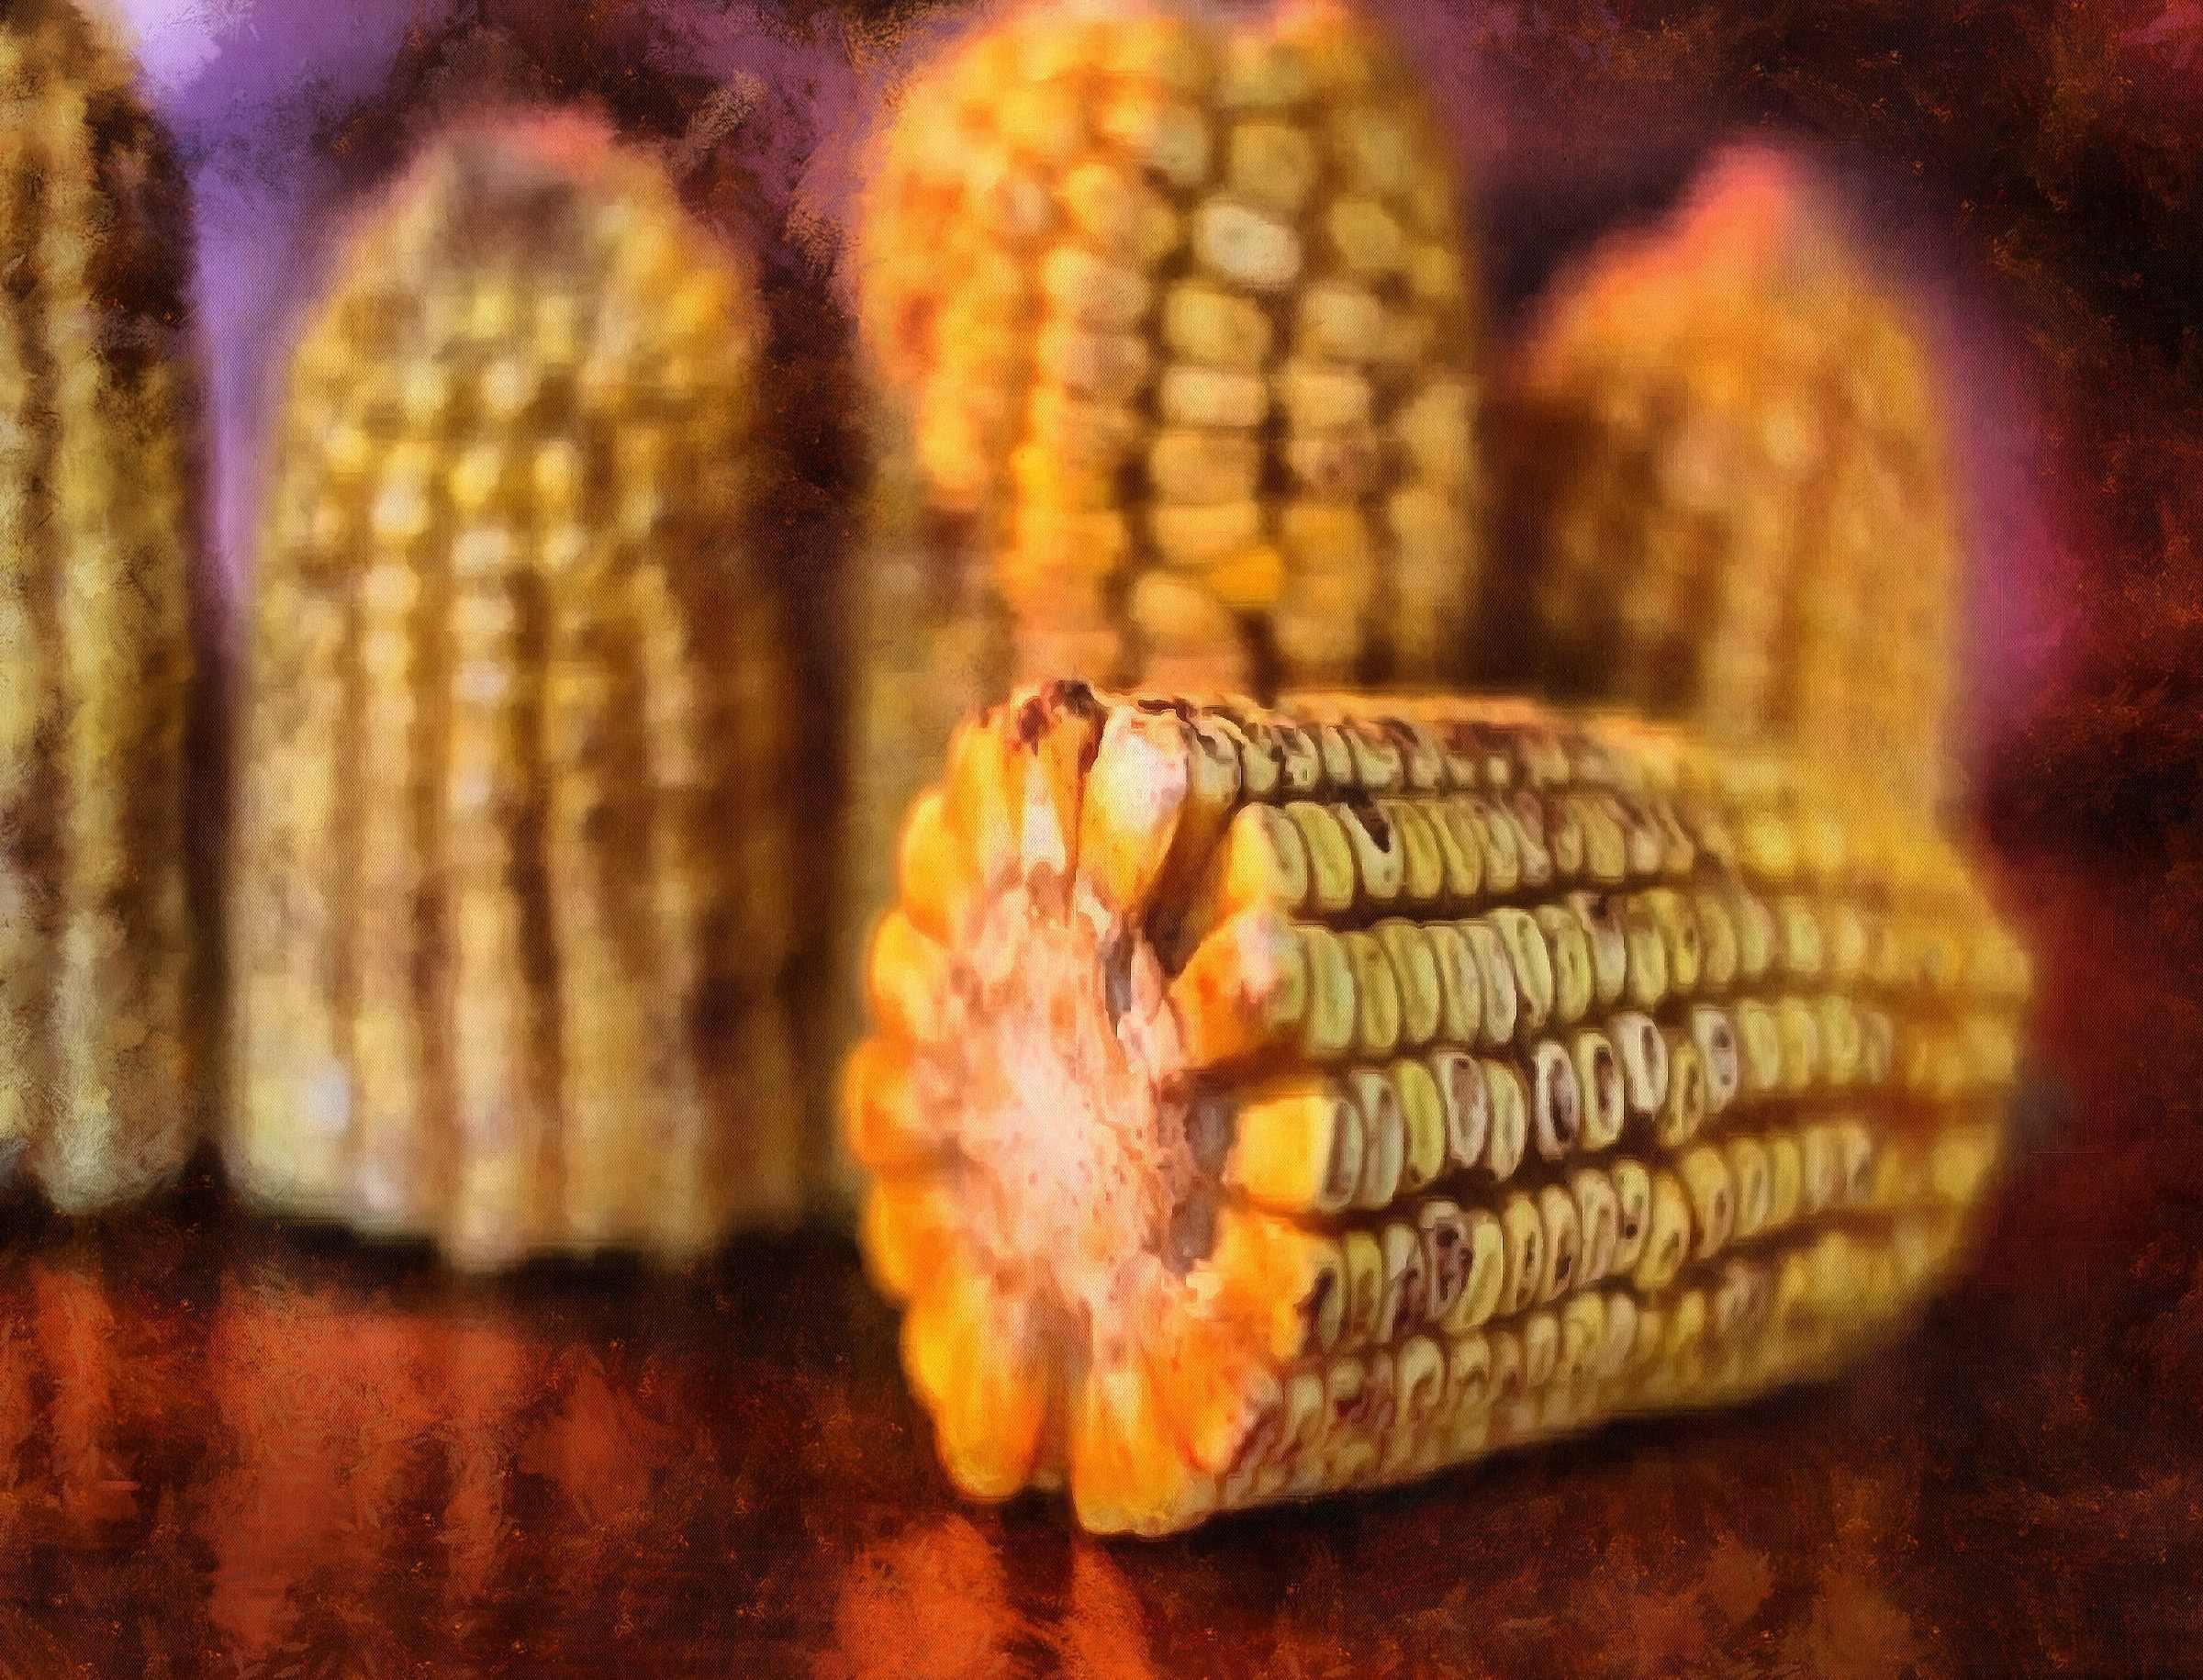 <br>corn on the cob, corn cobs, corn seeds,